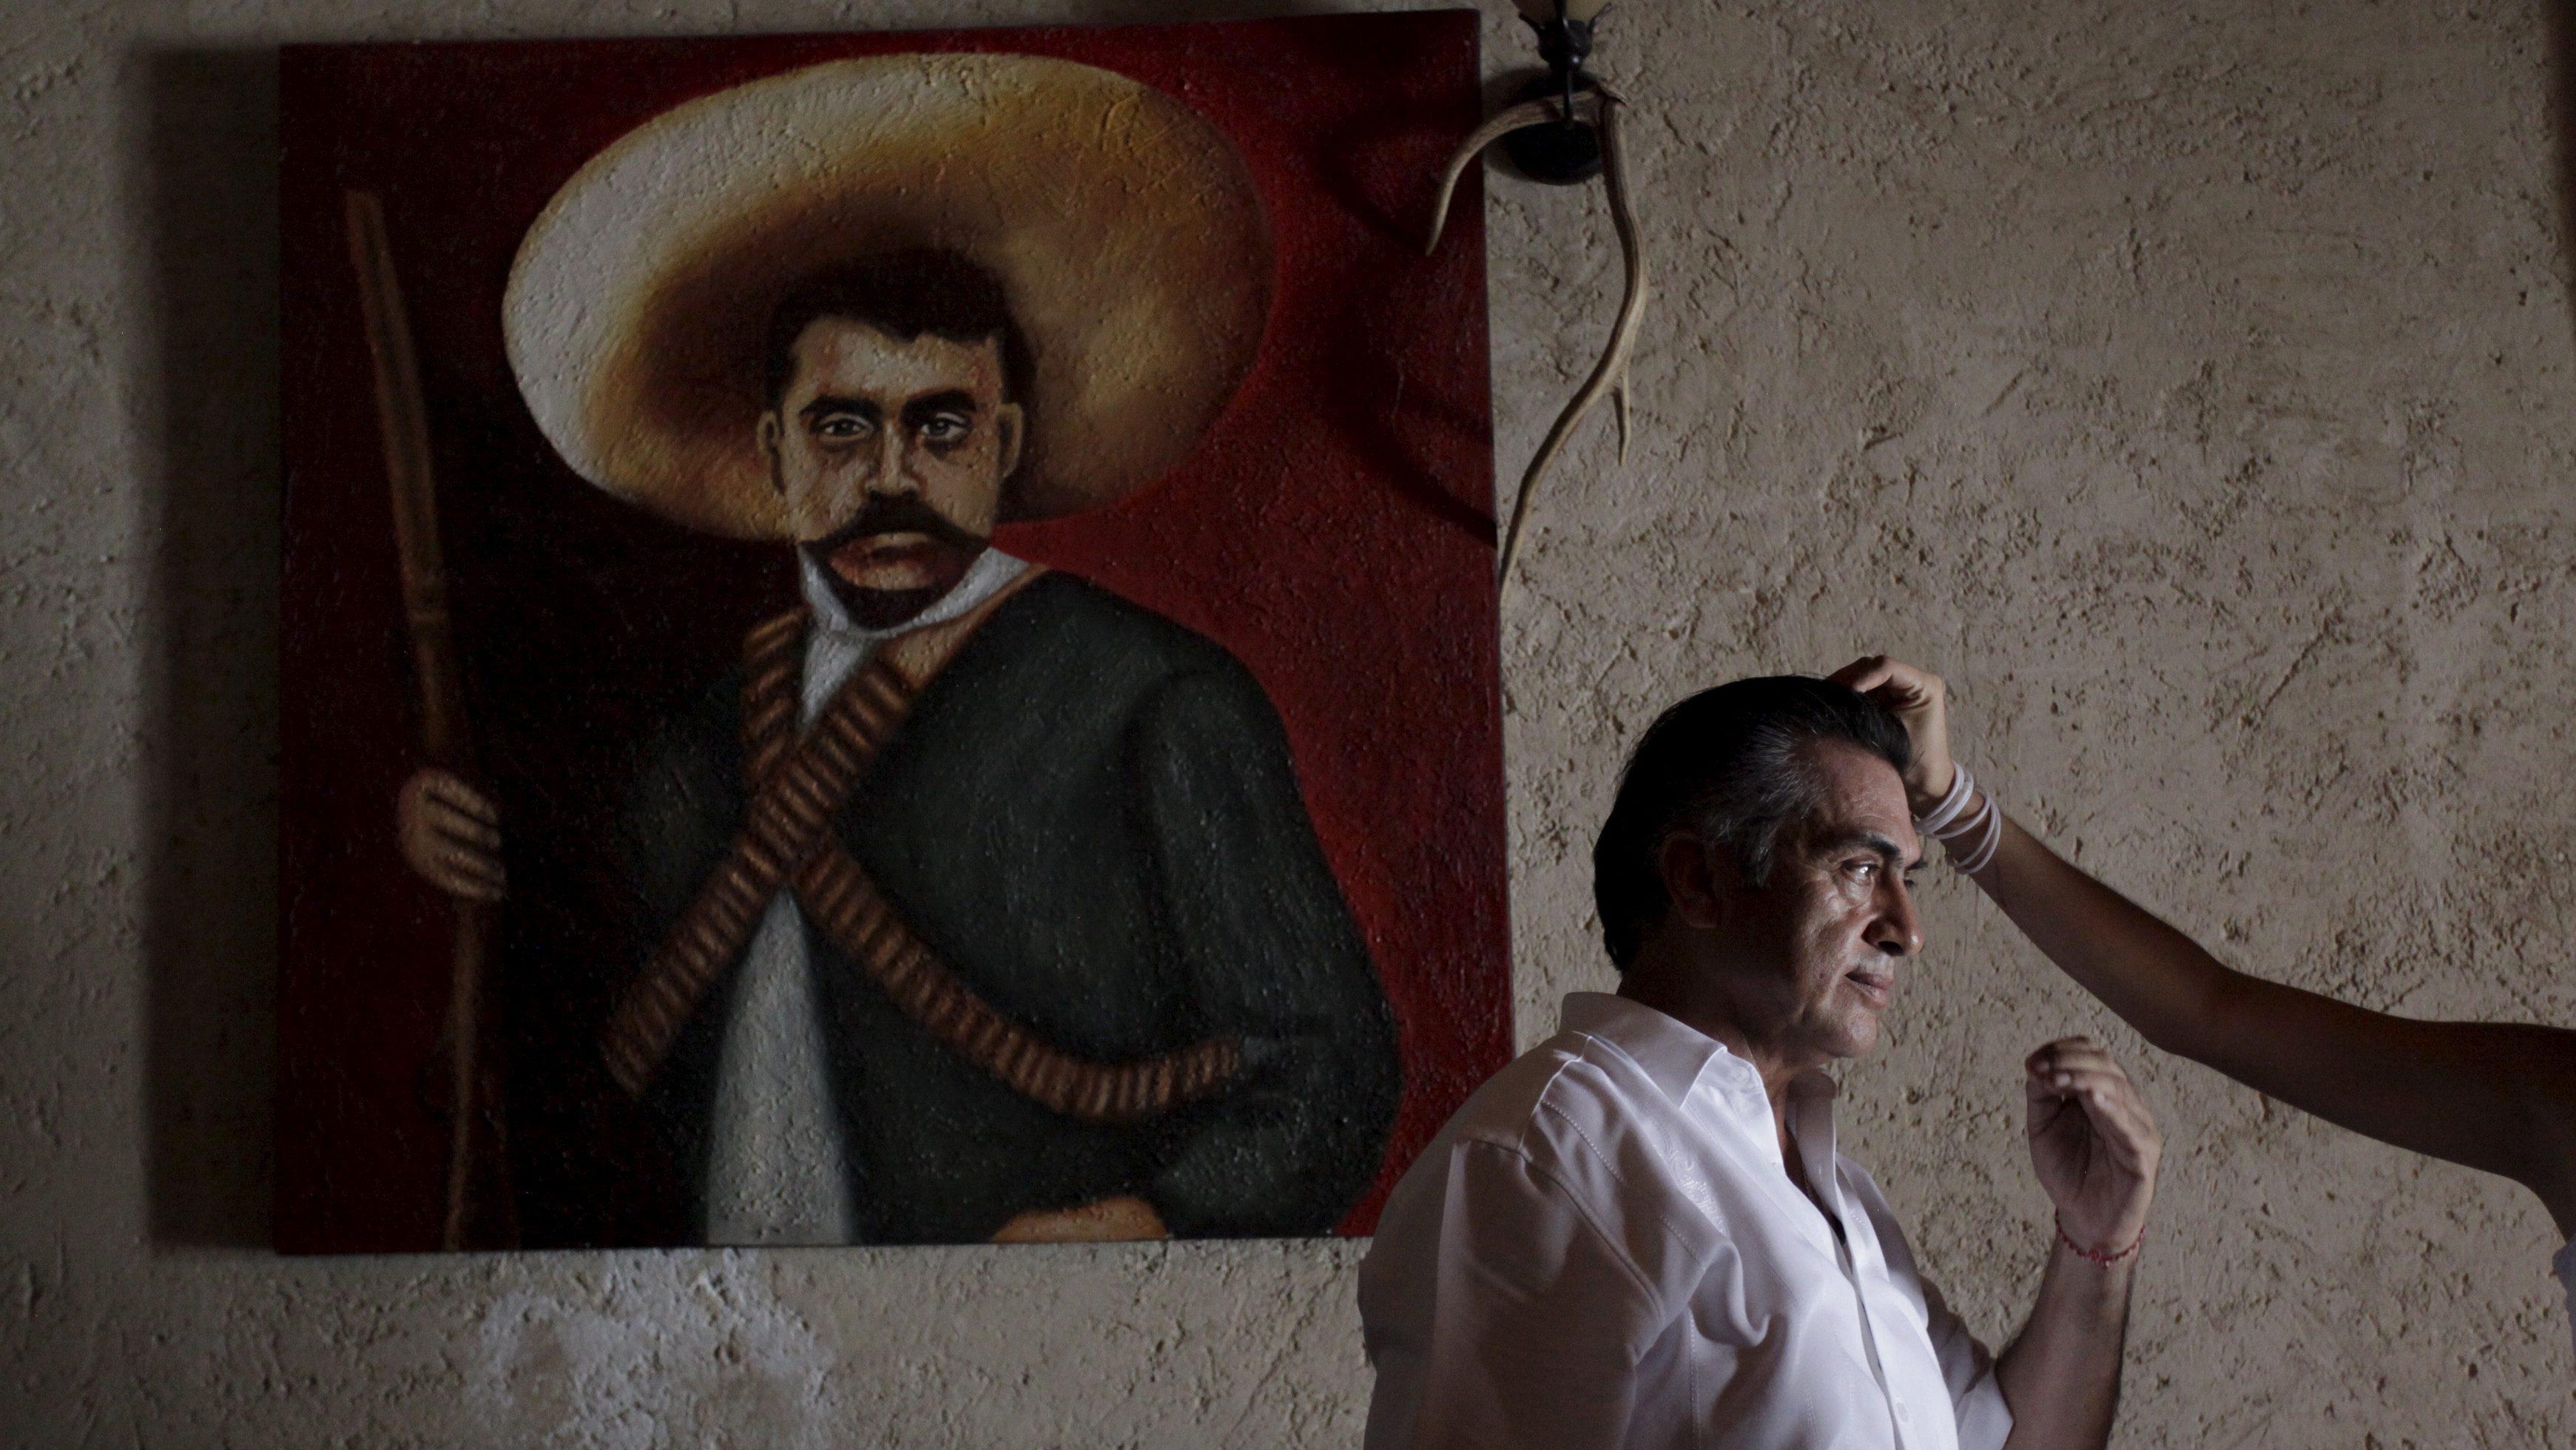 Jaime Rodriguez, governor-of Nuevo Leon state